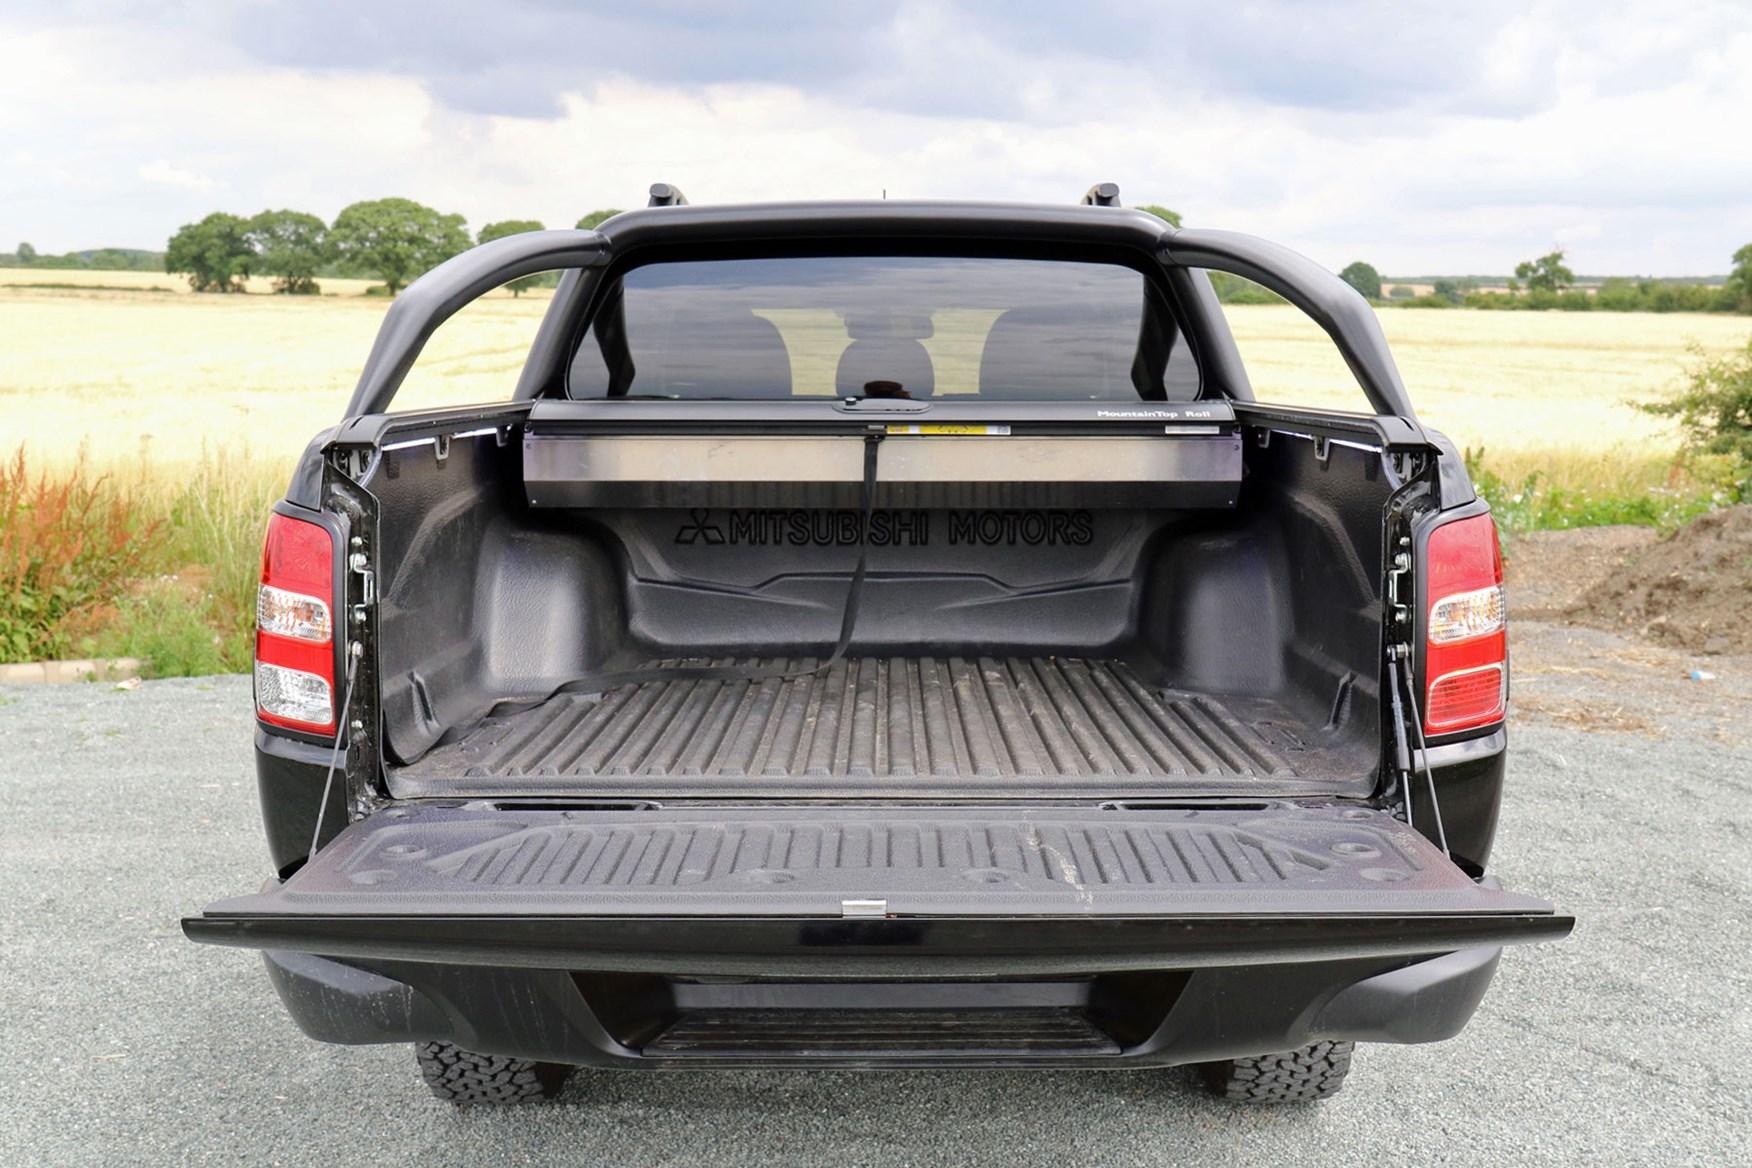 Mitsubishi L200 review, load bed area dimensions